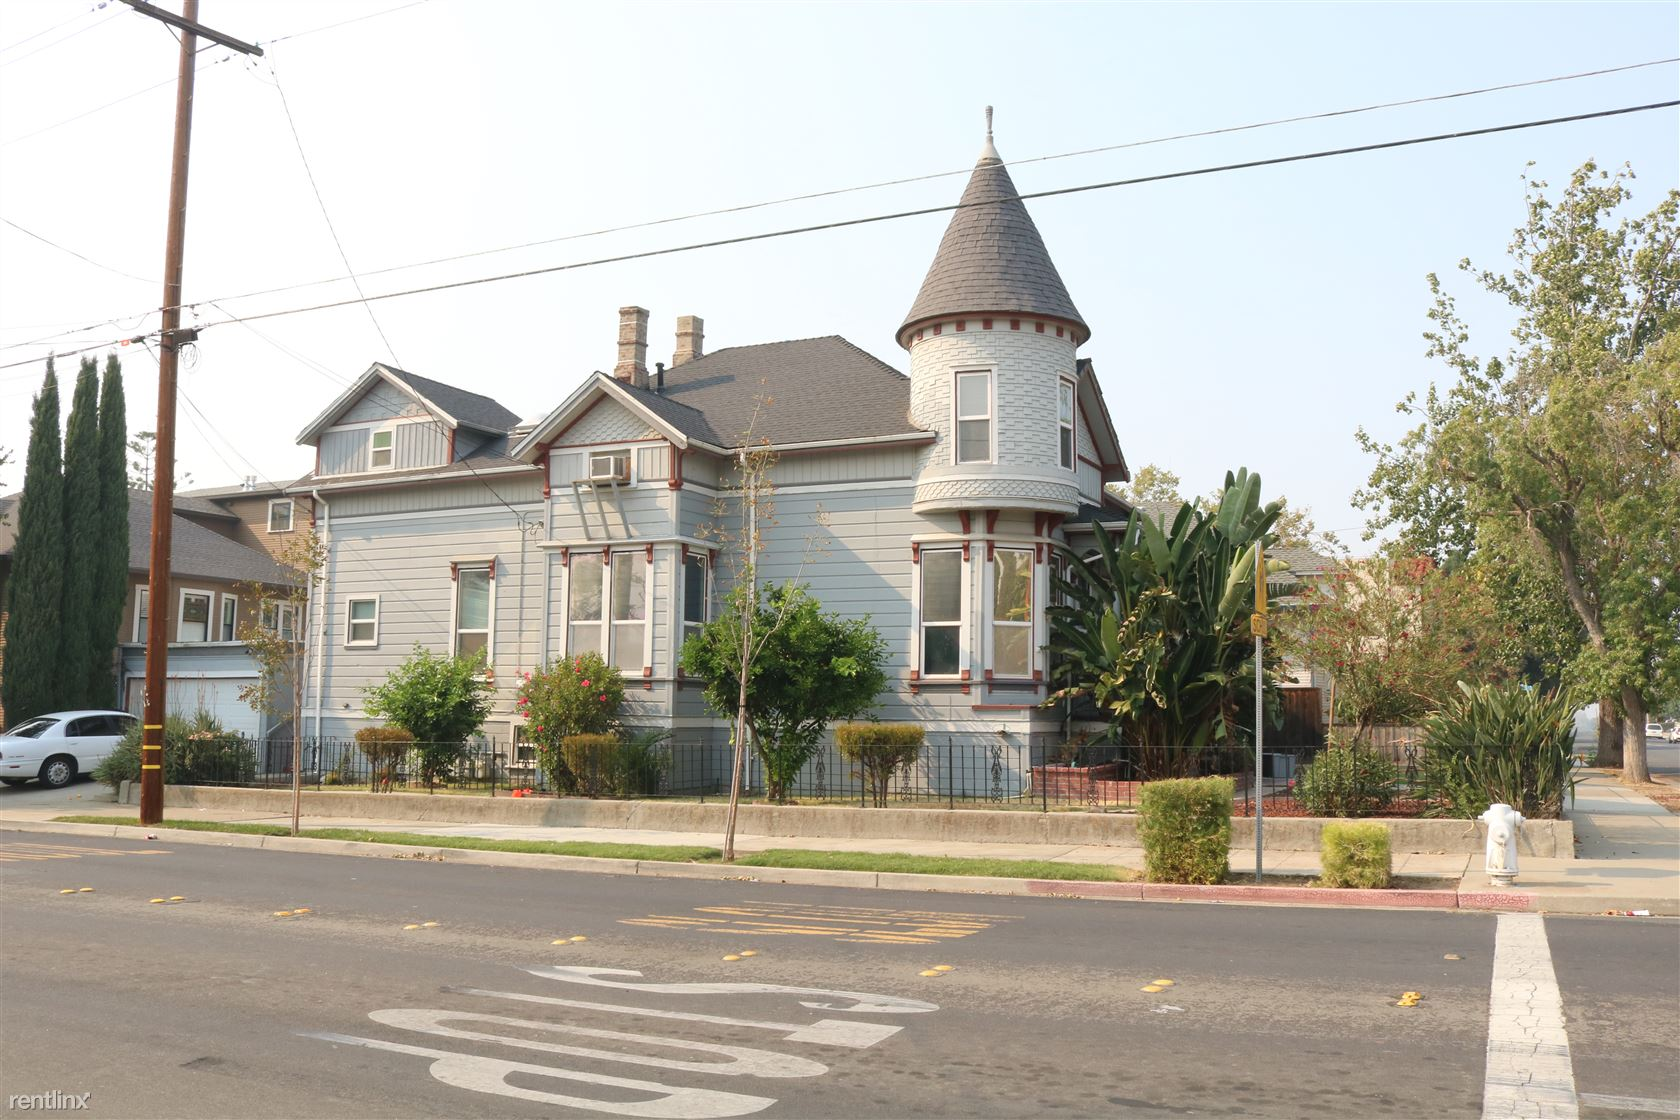 512 E St Unit B, Antioch, CA - $2,295